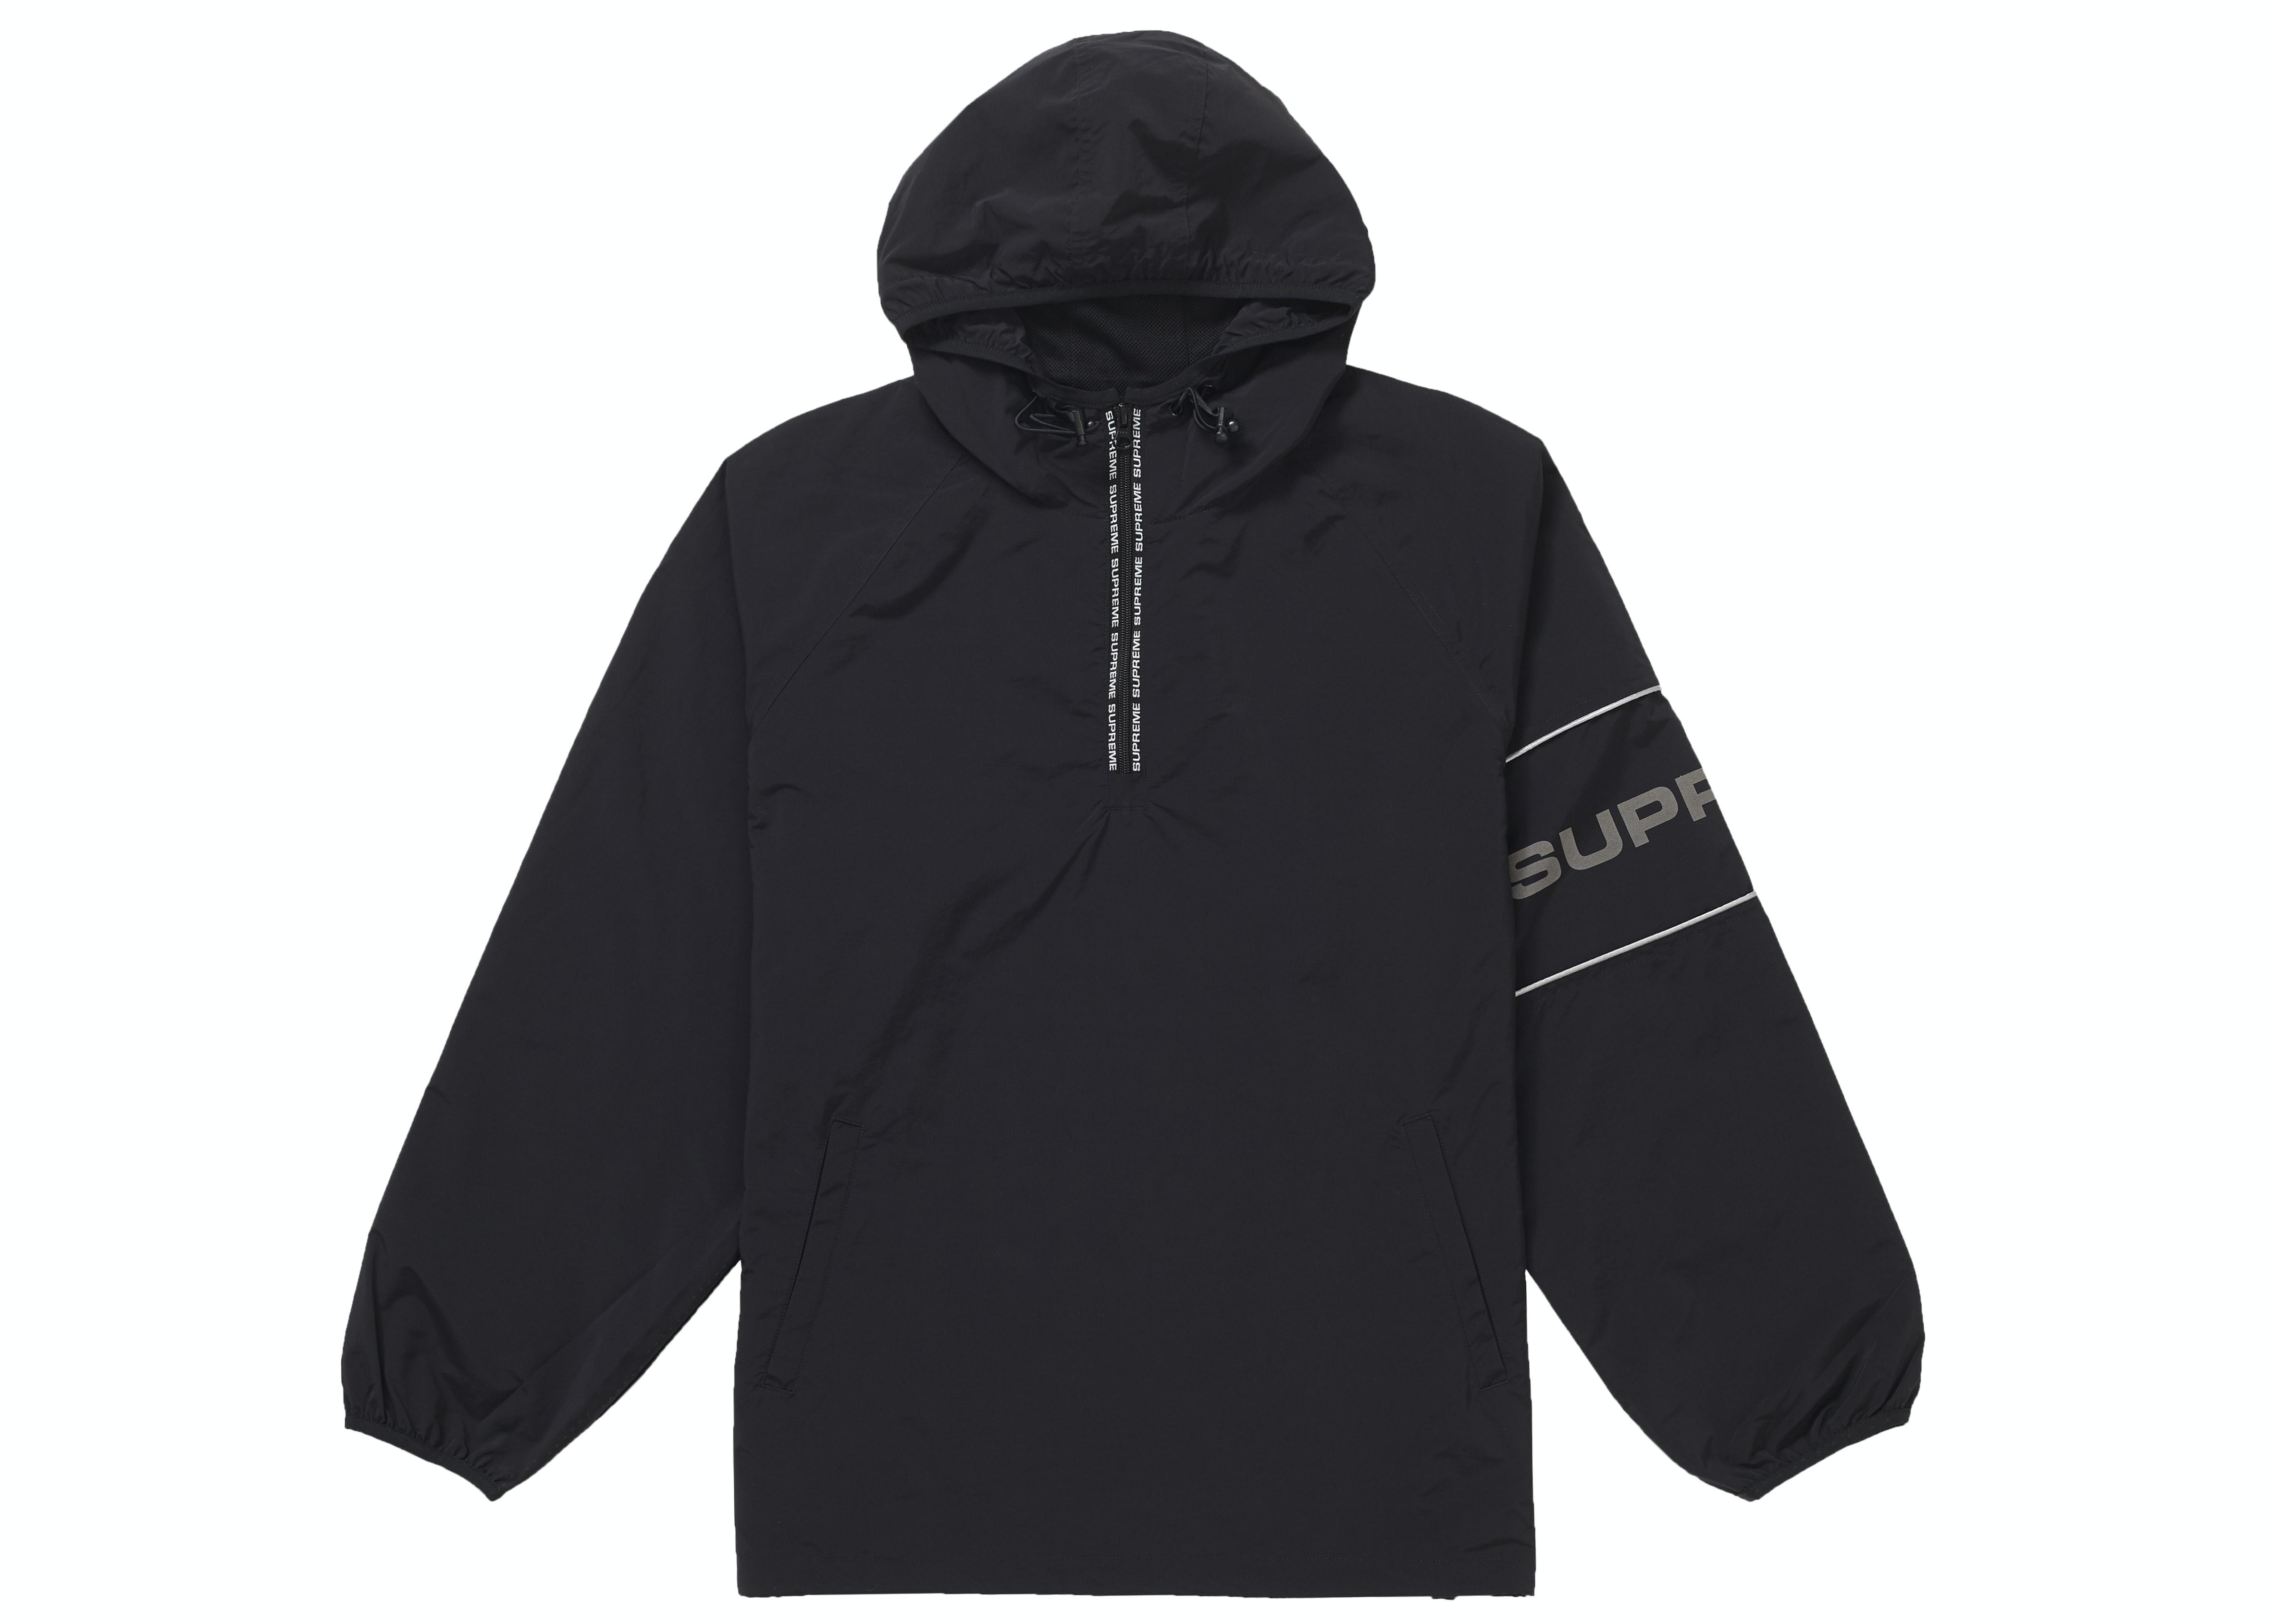 Supreme Nylon Ripstop Hooded Pullover Black